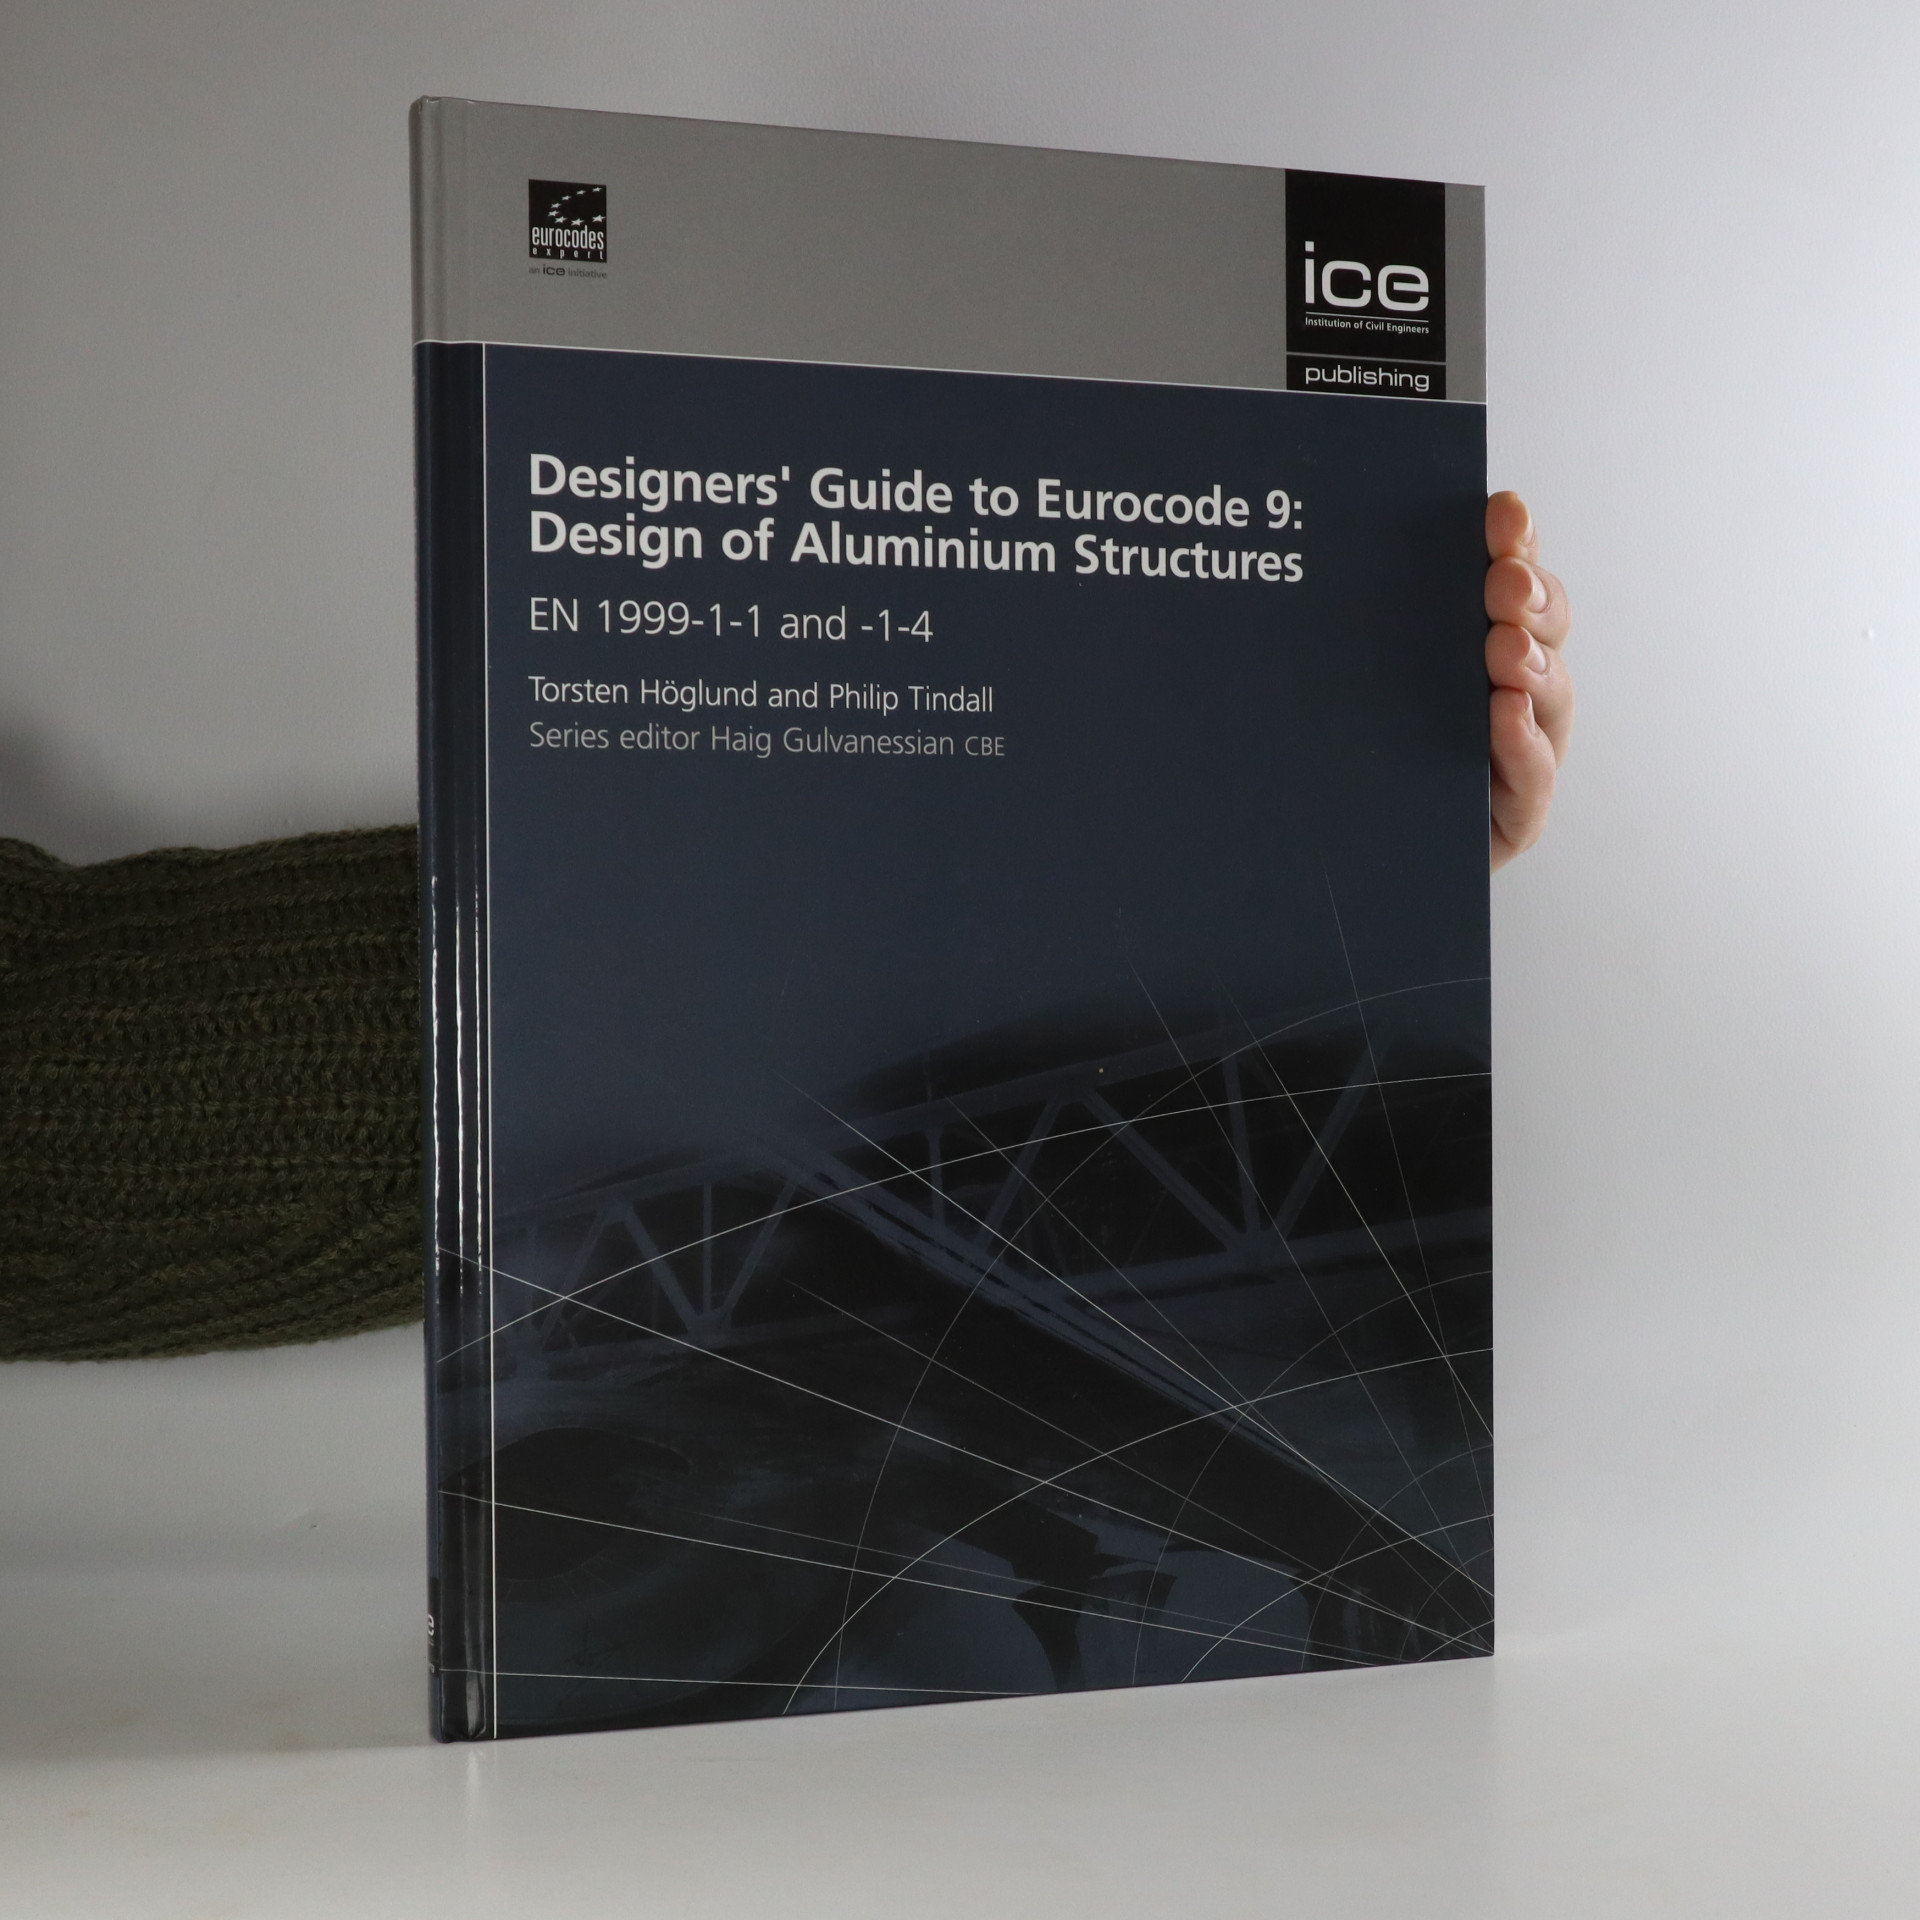 antikvární kniha Designer's Guide to Eurocode 9. Design of Aluminium Structures, neuveden